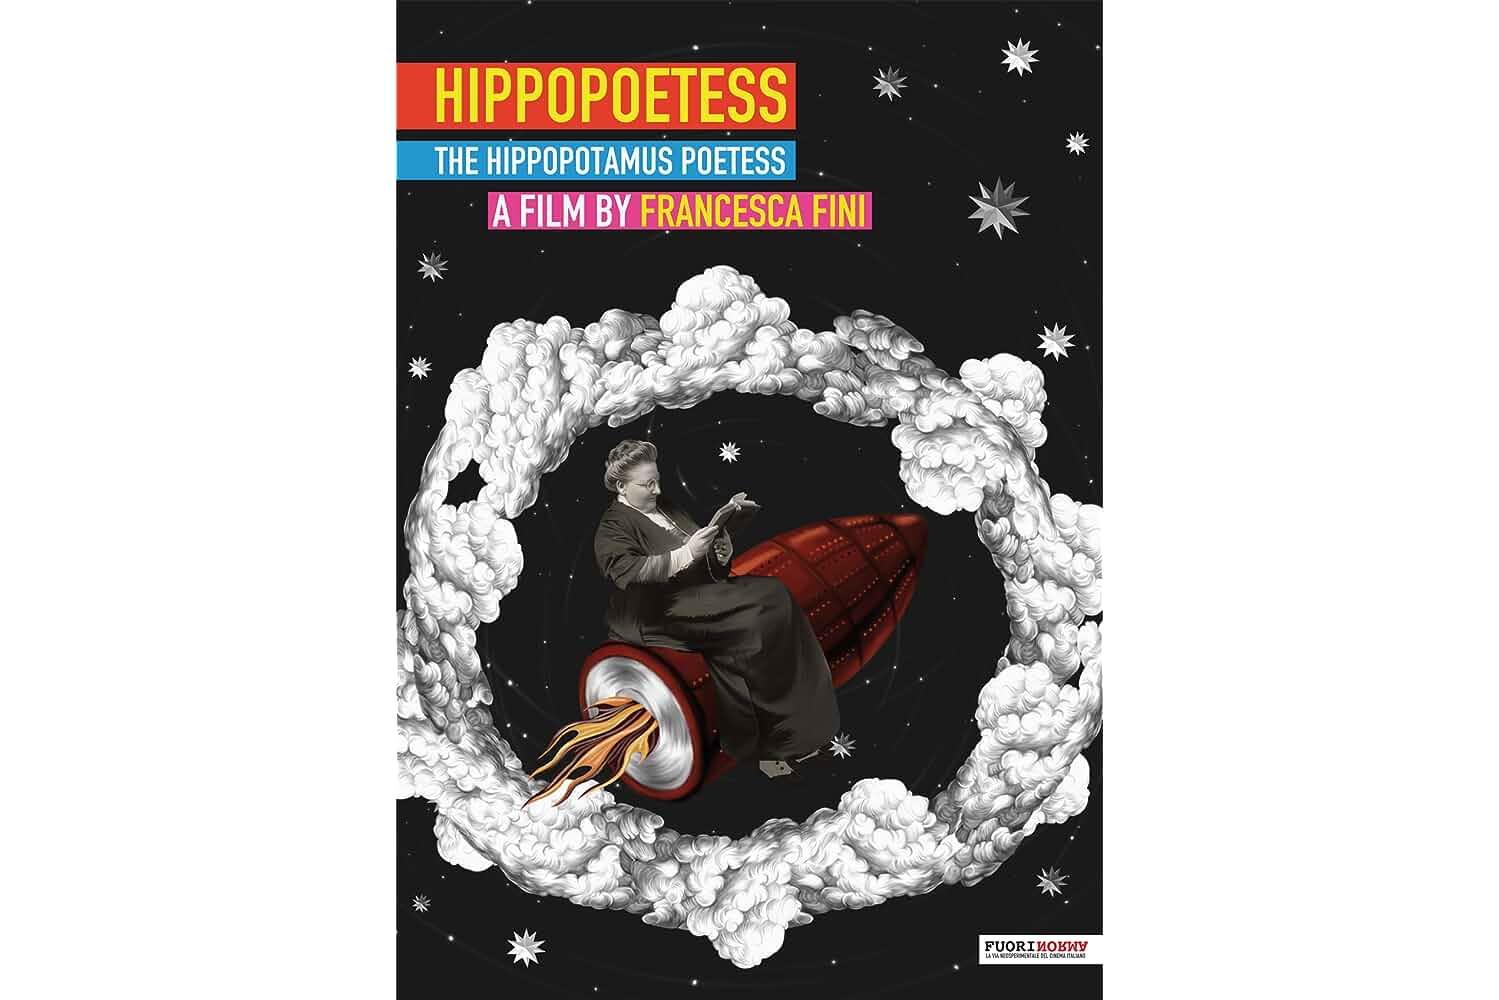 Hippopoetess (2018)